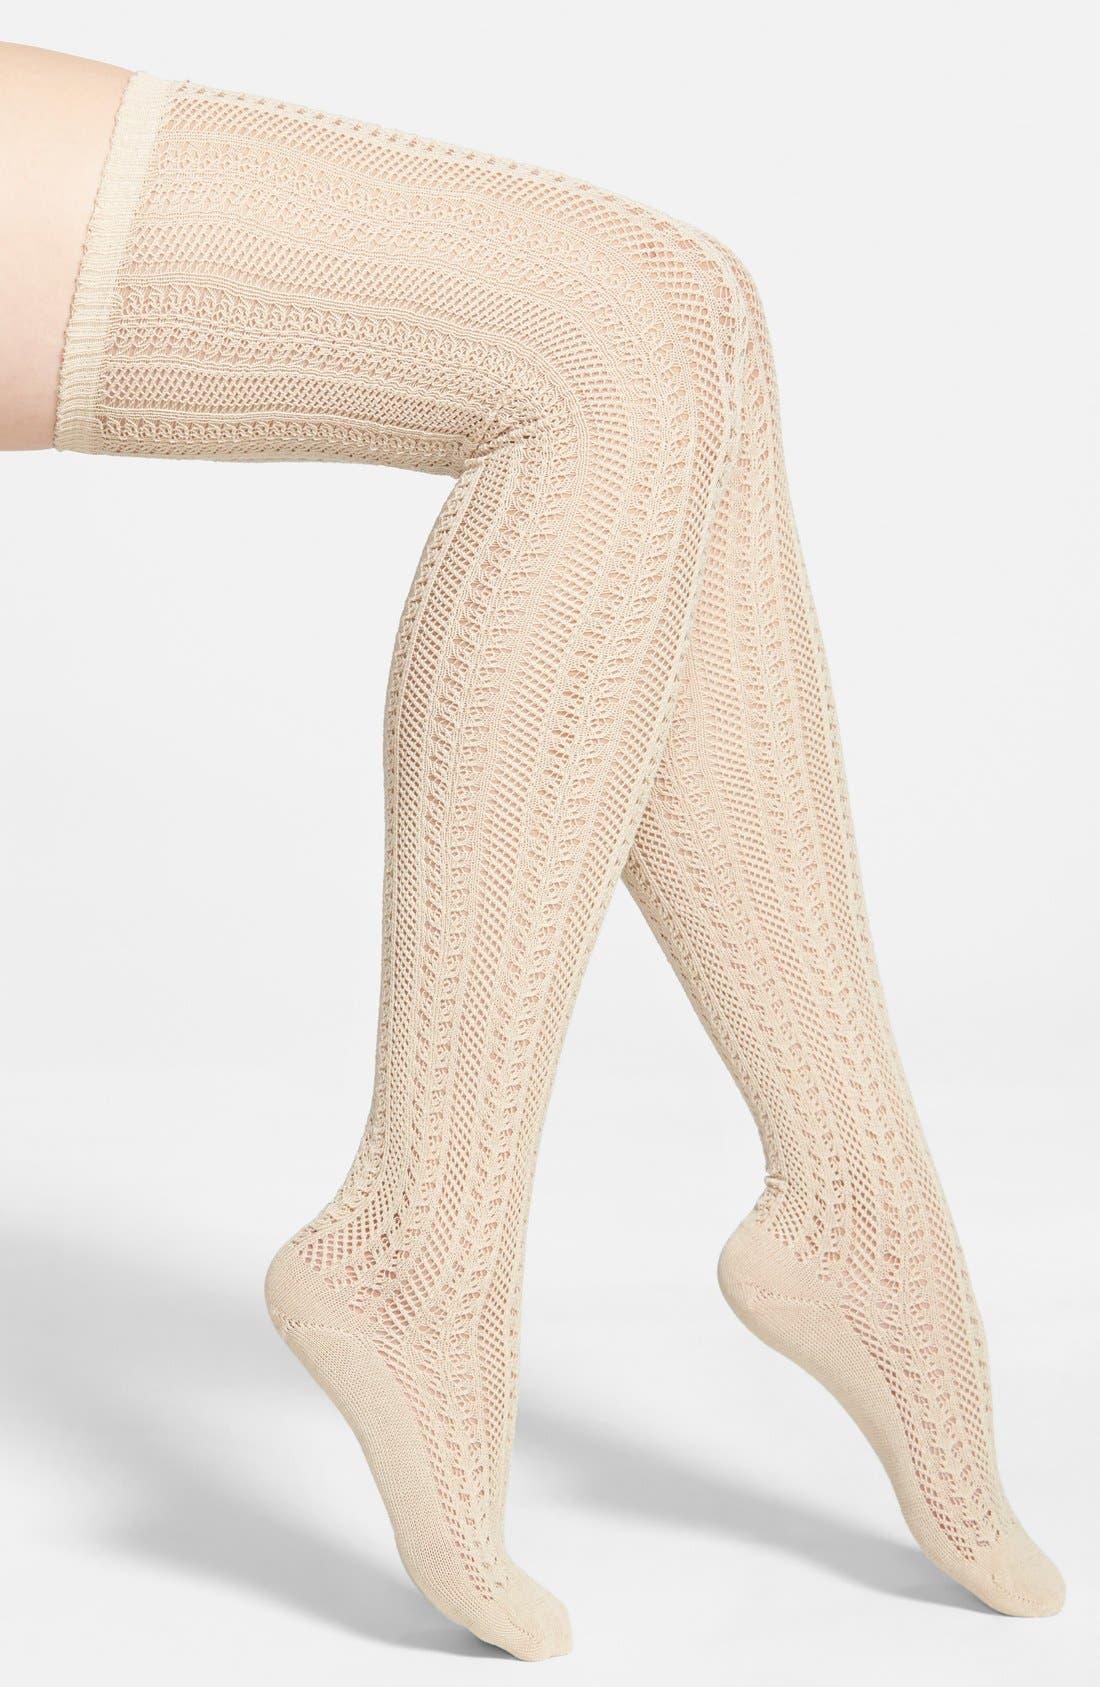 Alternate Image 1 Selected - Free People 'Hammock' Openwork Knit Thigh High Socks